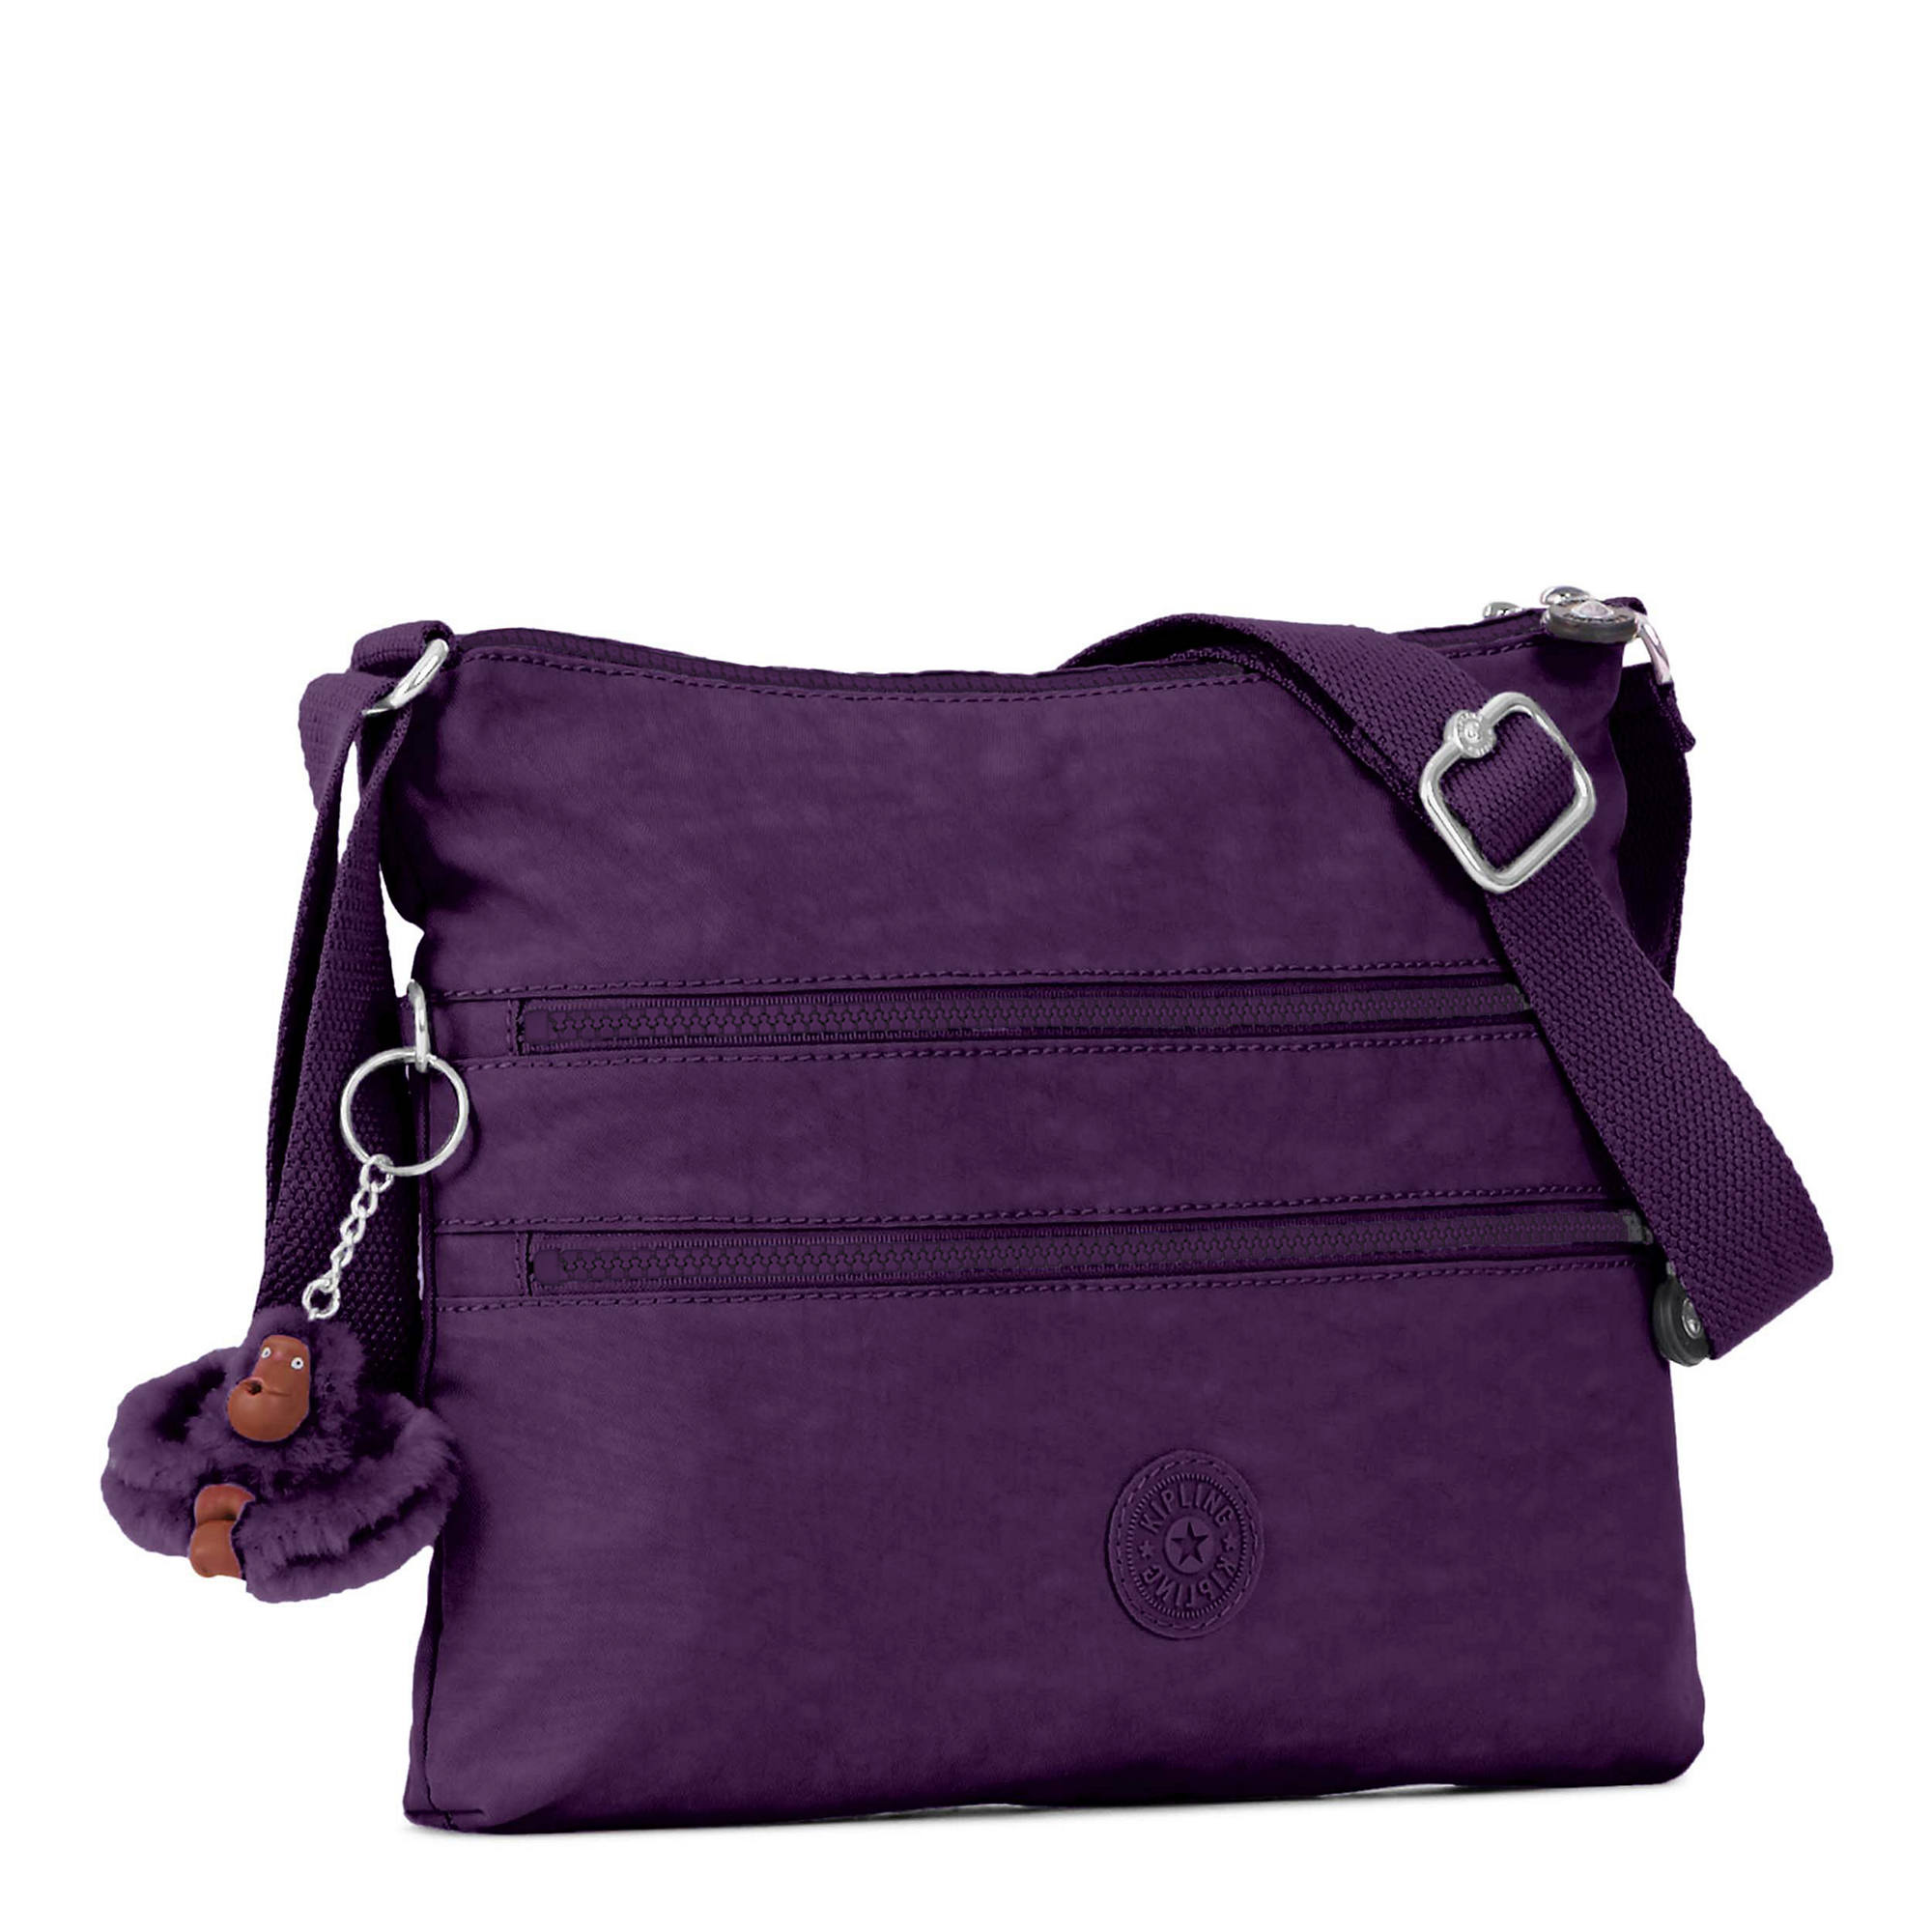 Alvar Crossbody Bag,Deep Purple,large abb62de7a6